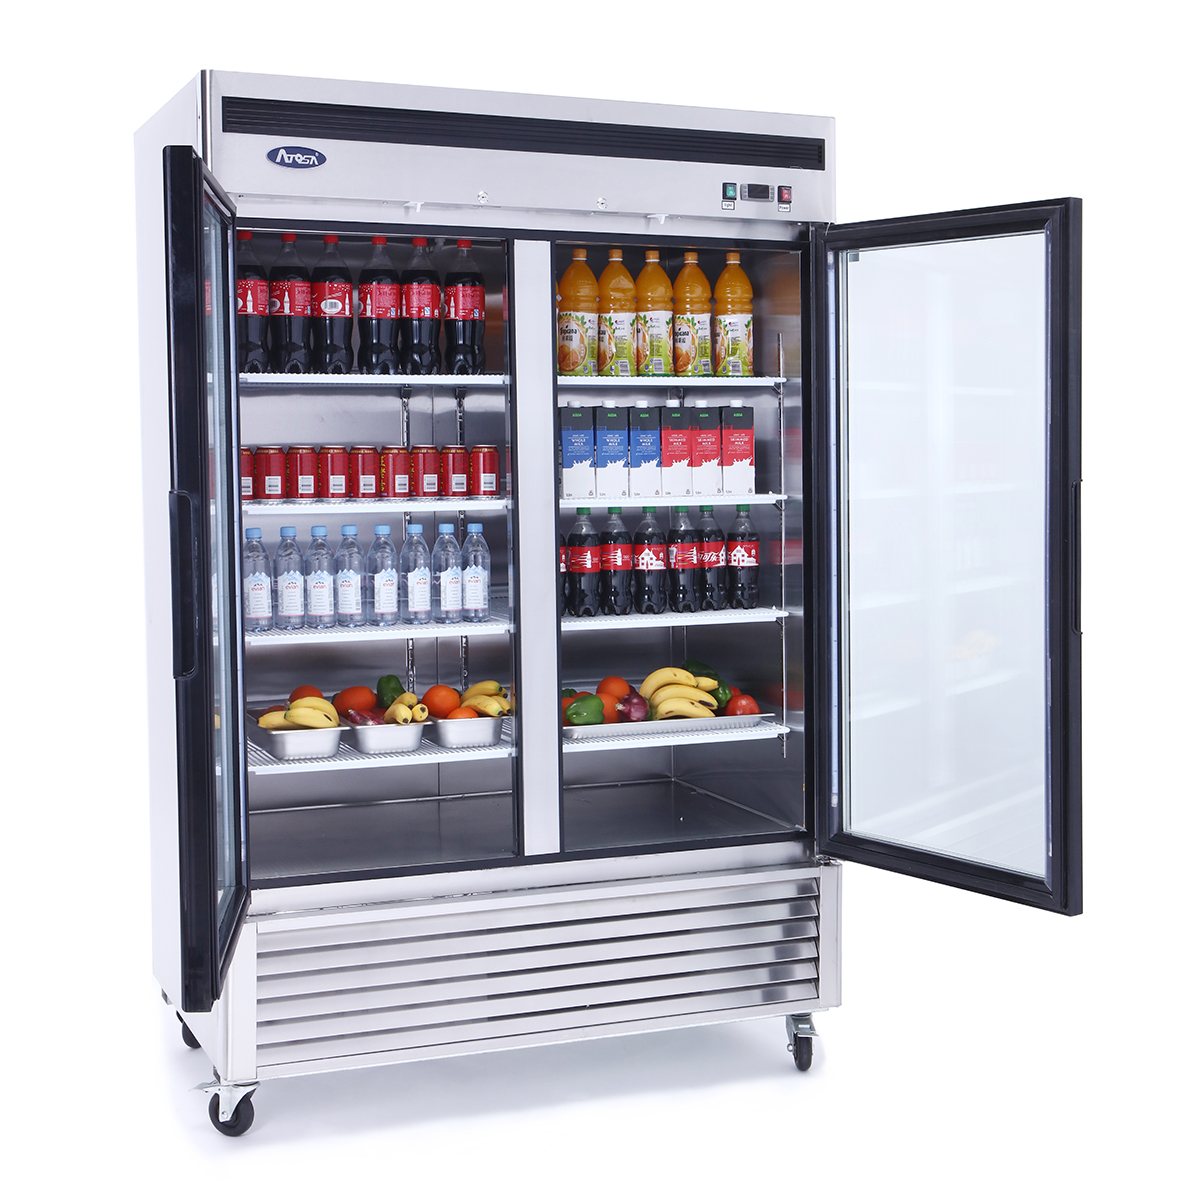 swinging doors on commercial refrigerator